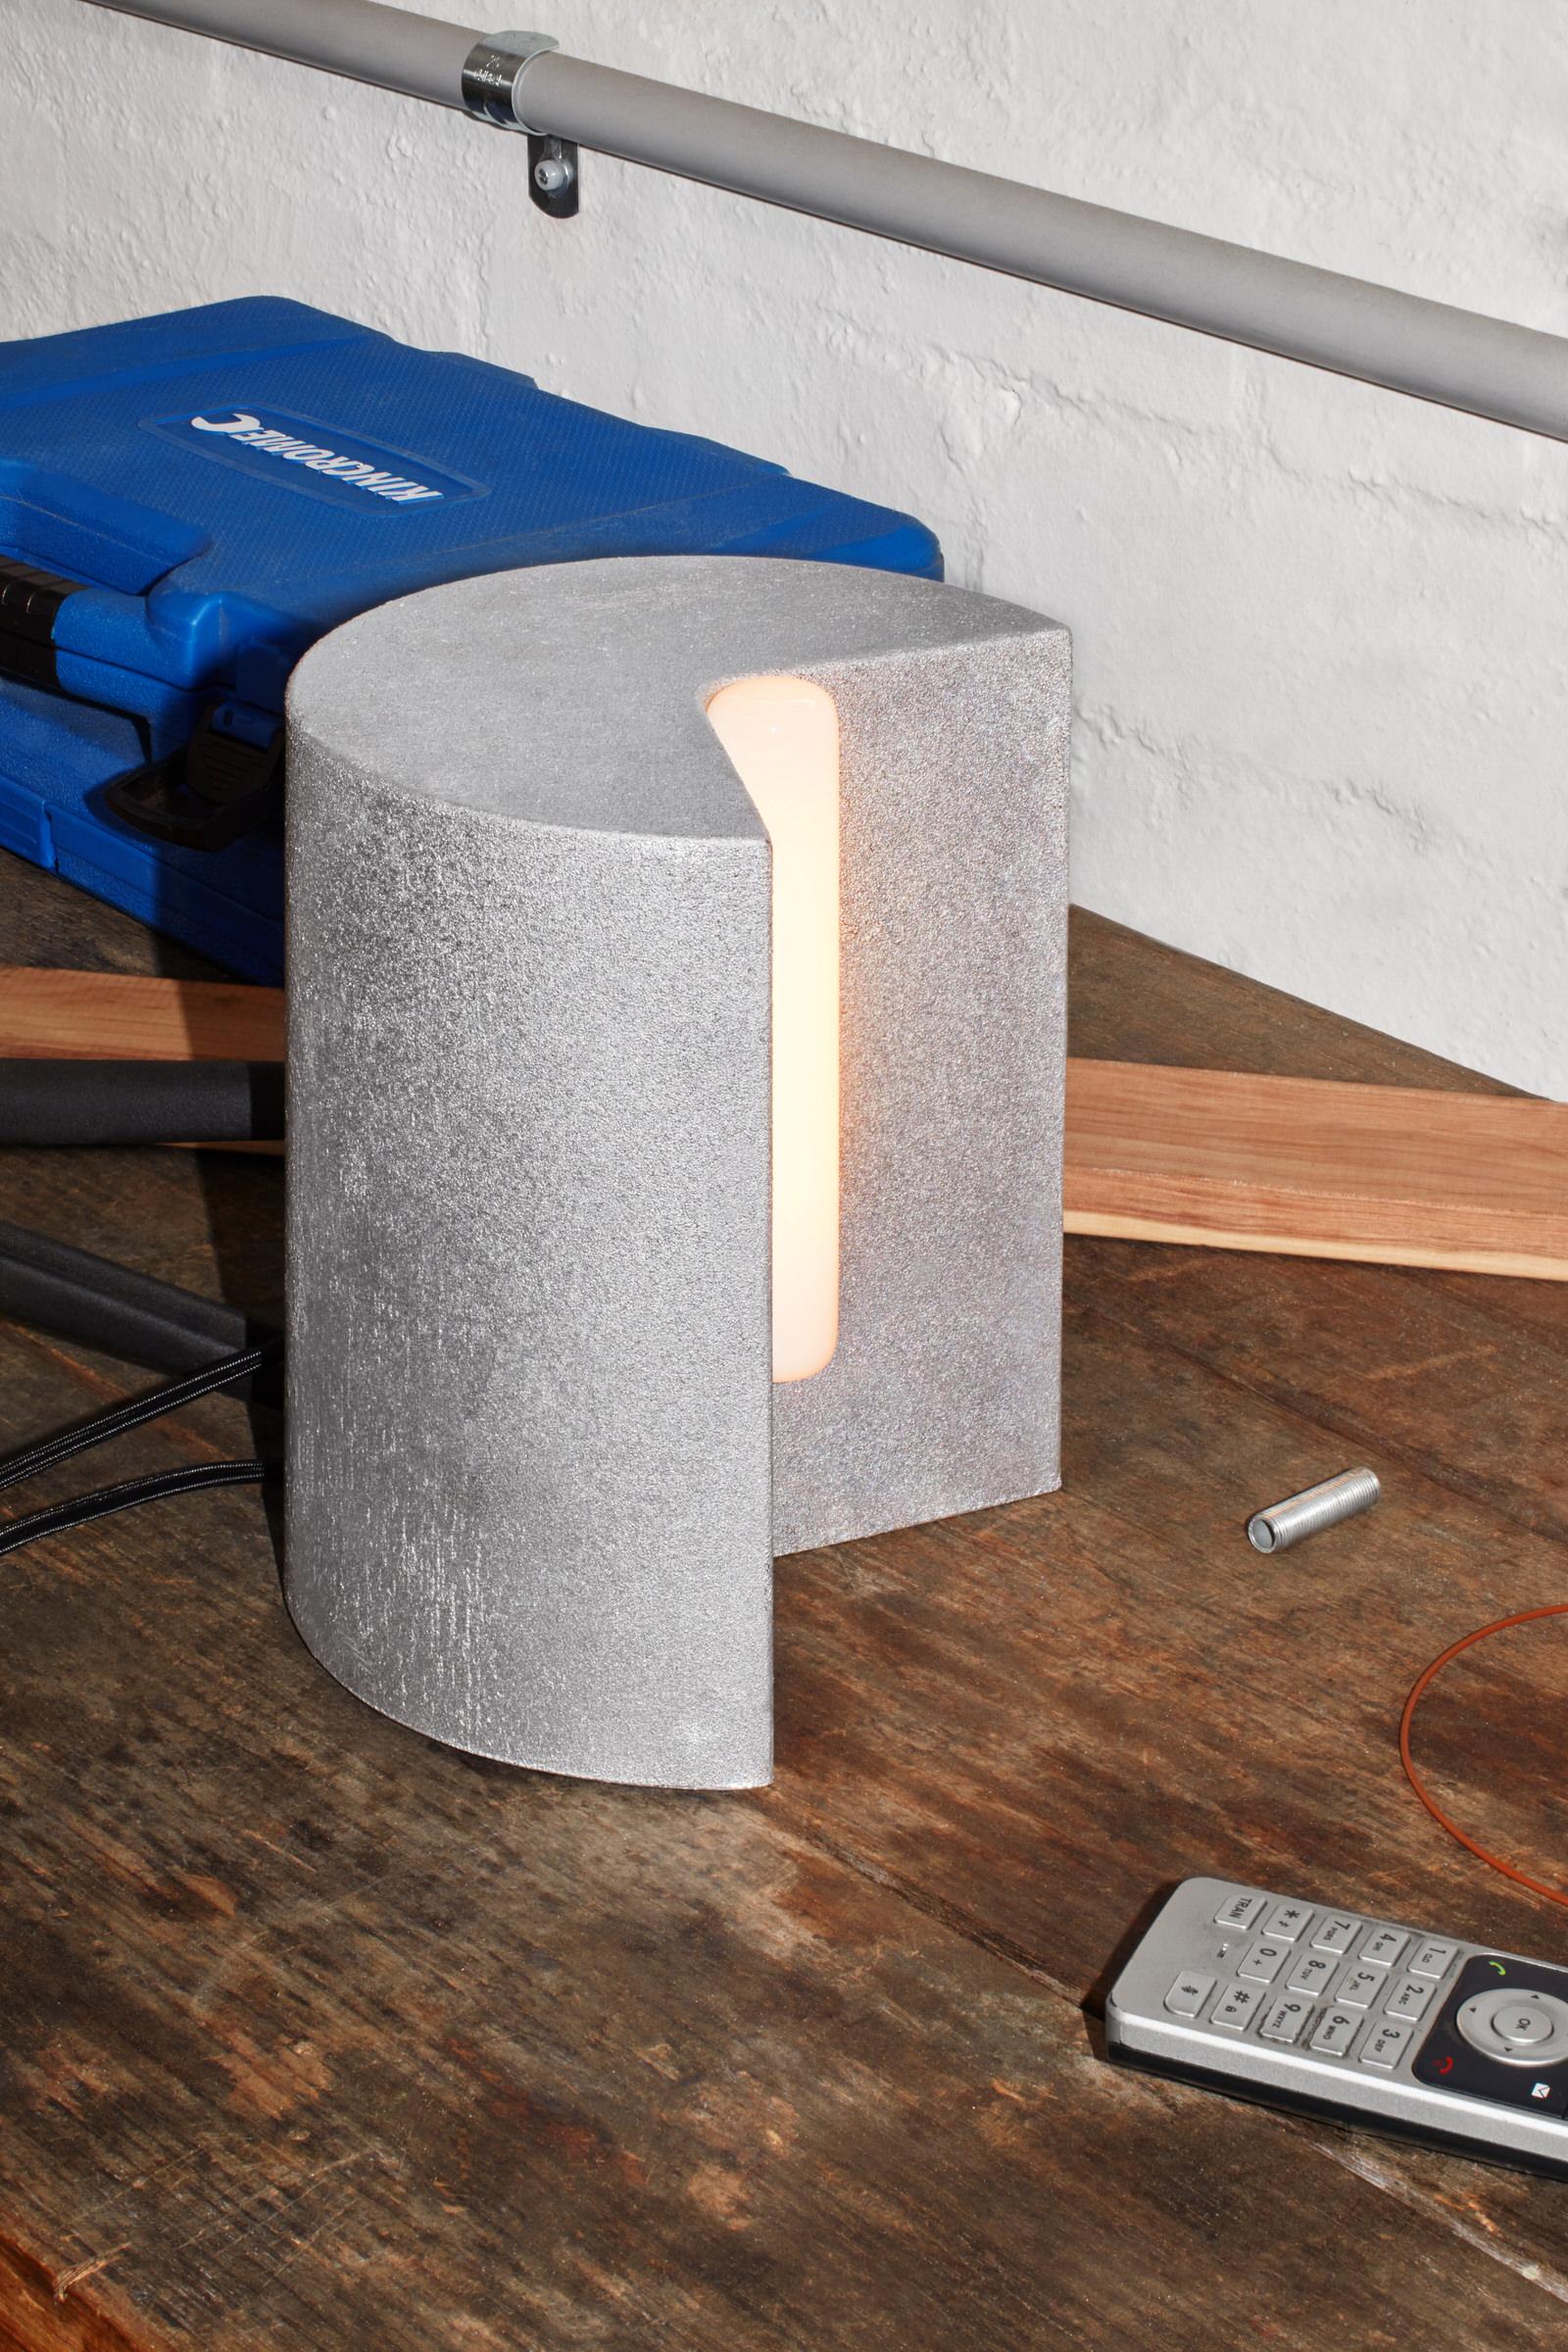 Volker Haug Studio Tableton Lamp Collection Styling Marsha Golemac Photo Morgan Hickinbotham Yellowtrace 01